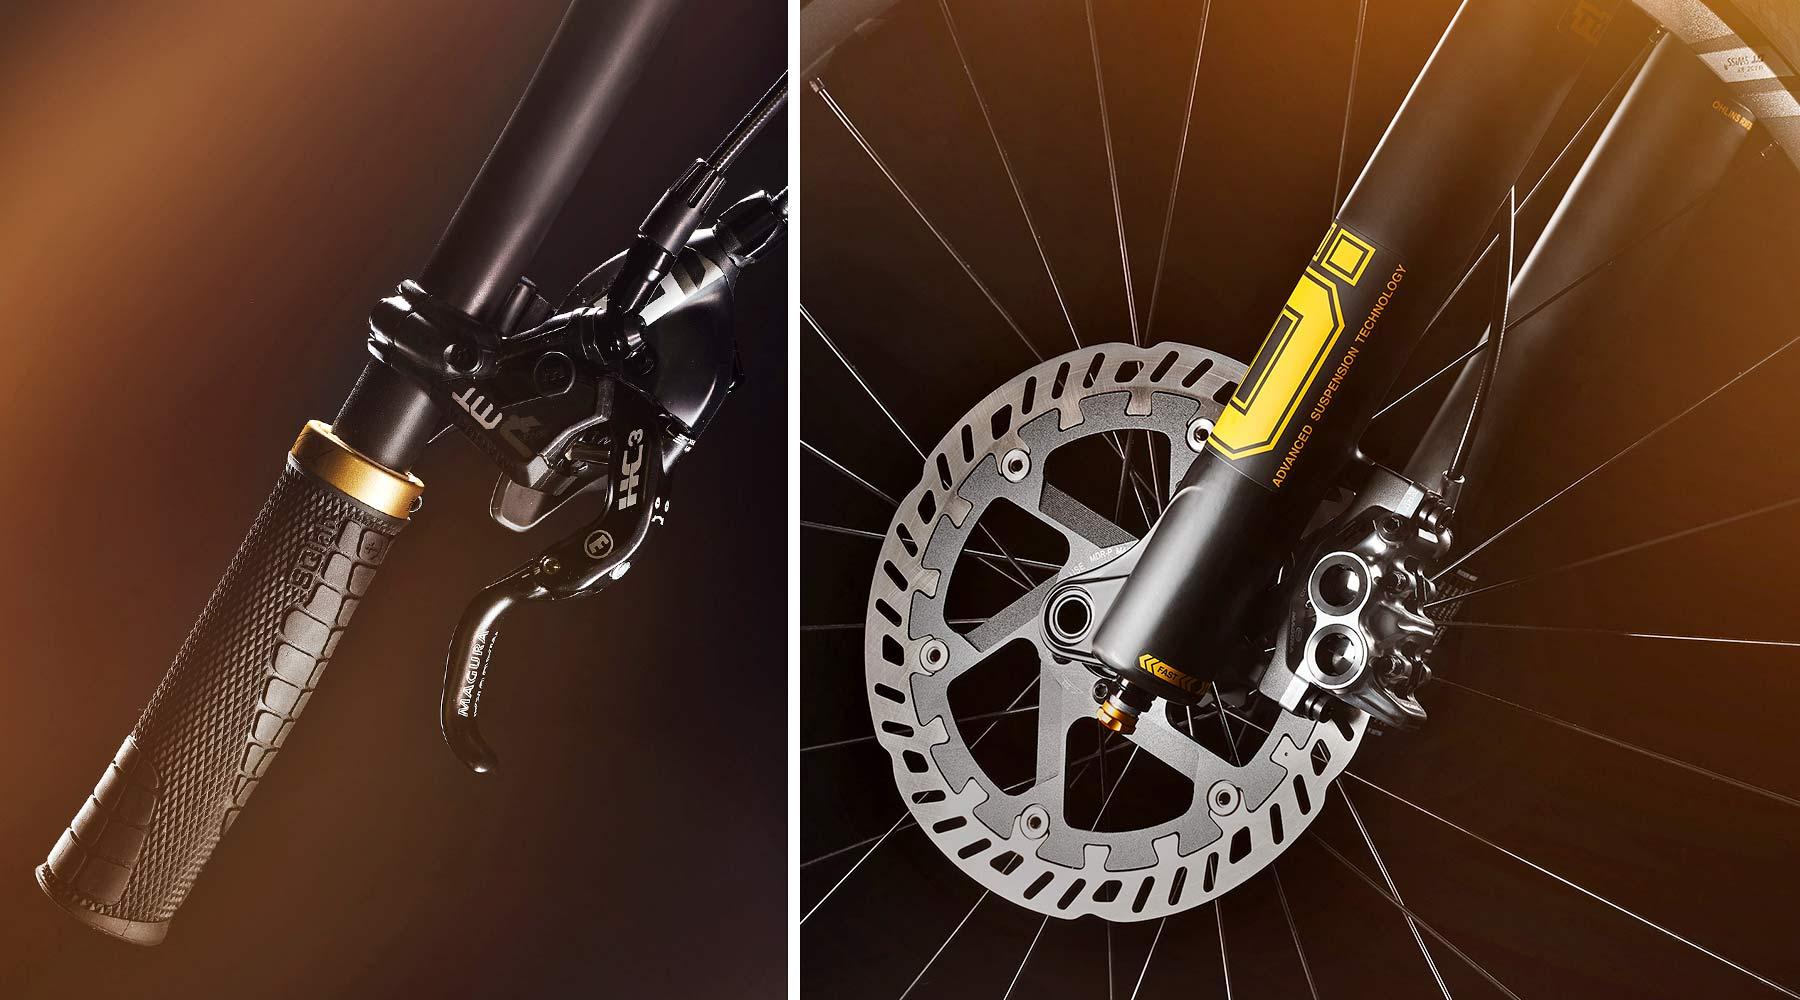 Canyon Torque CF Fabio Wibmer Signature Edition limited pro carbon freeride enduro bike,Magura details